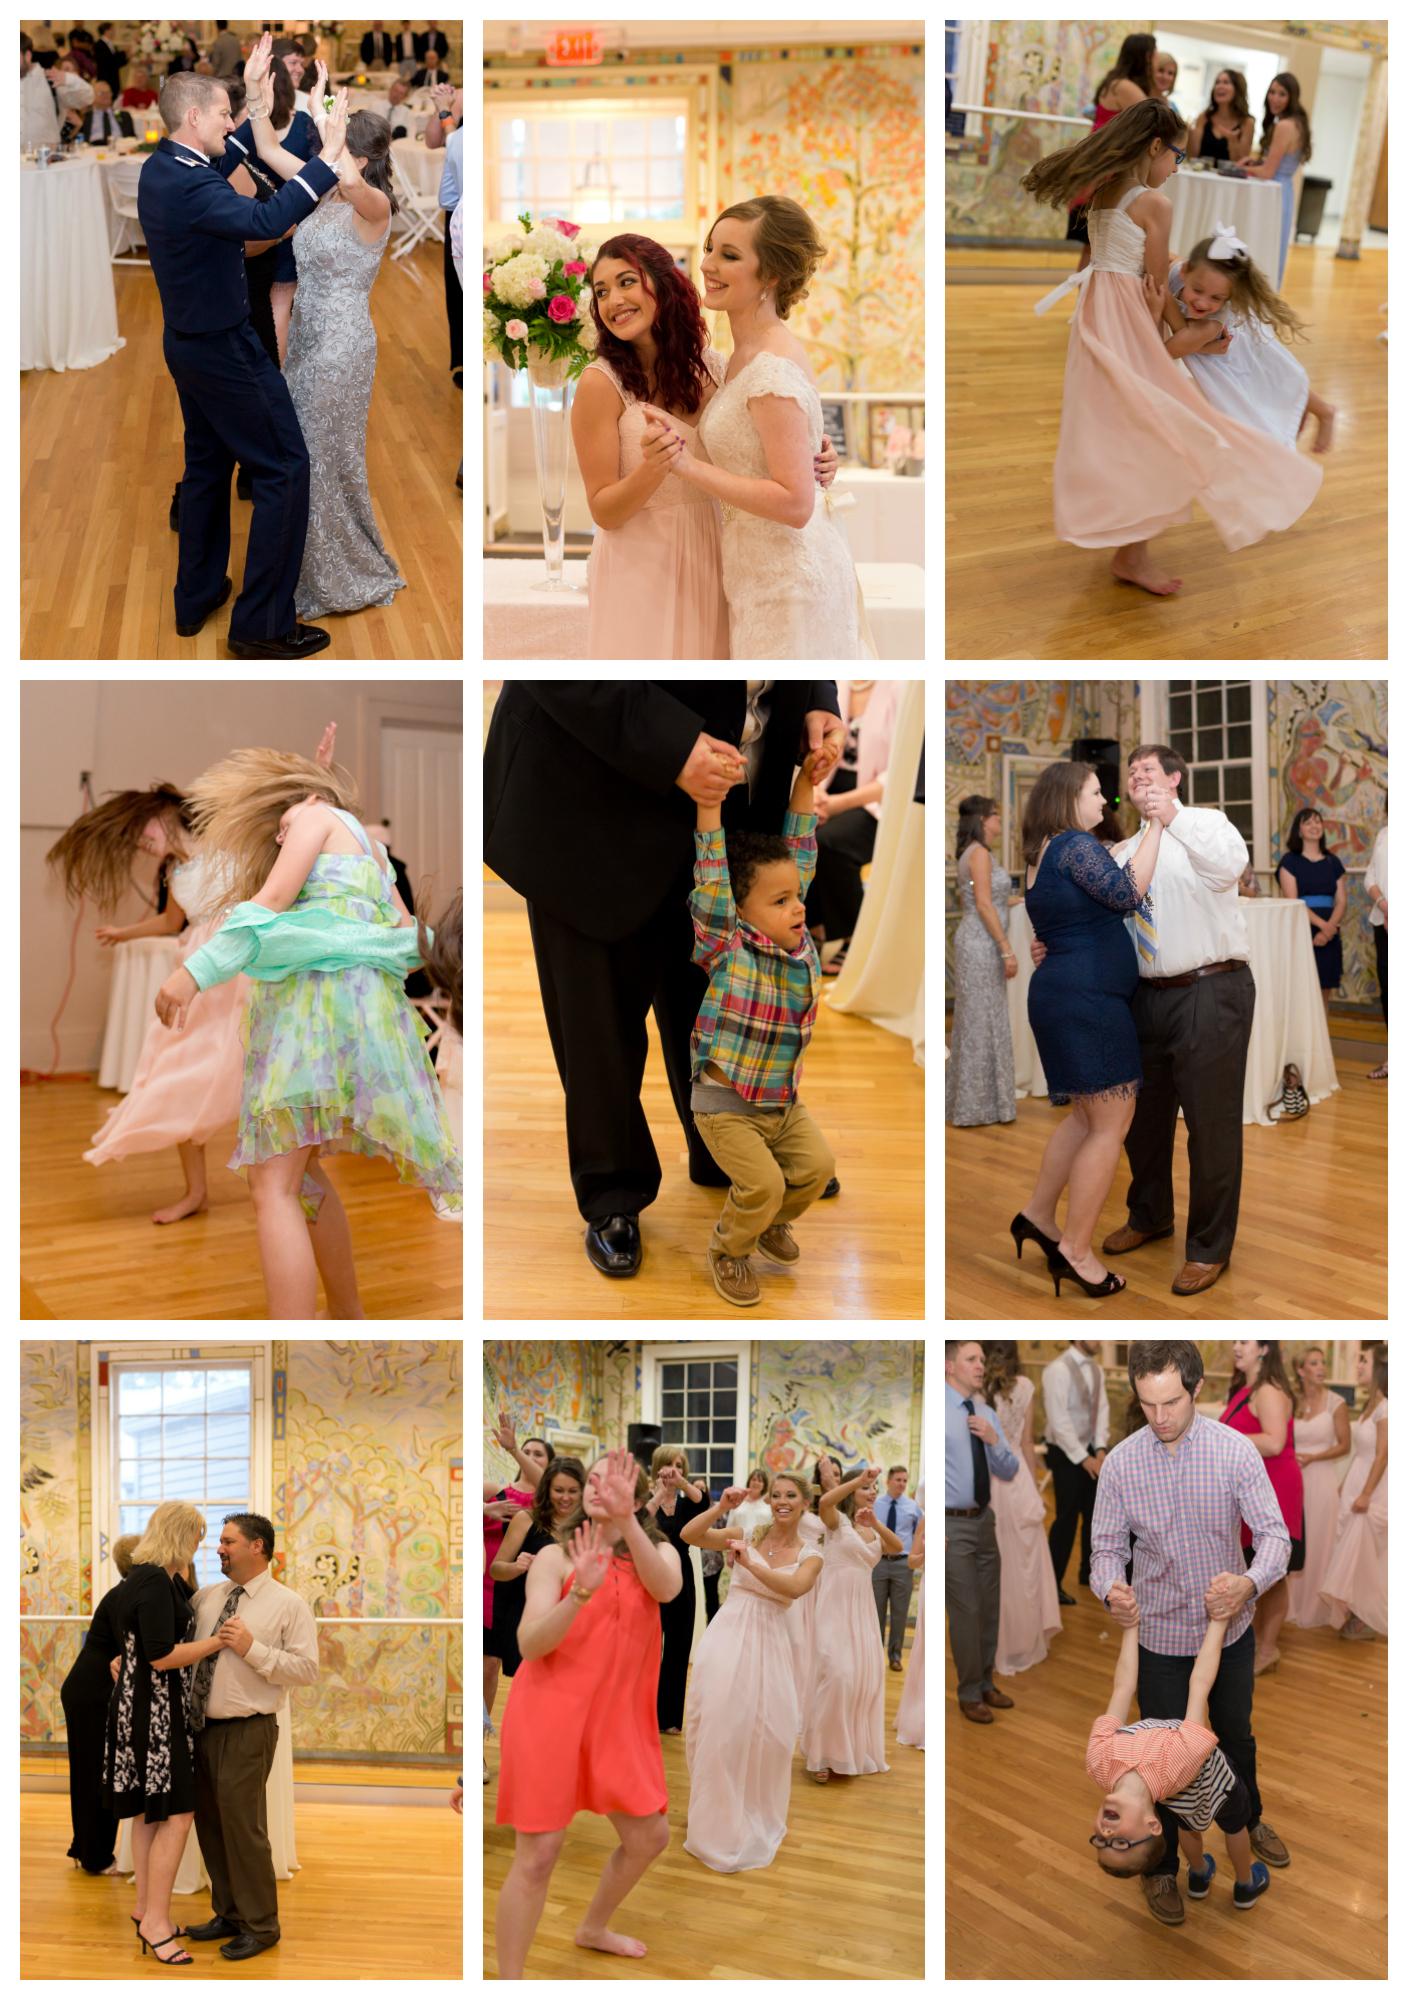 dancing at wedding reception at Ocean Springs Community Center